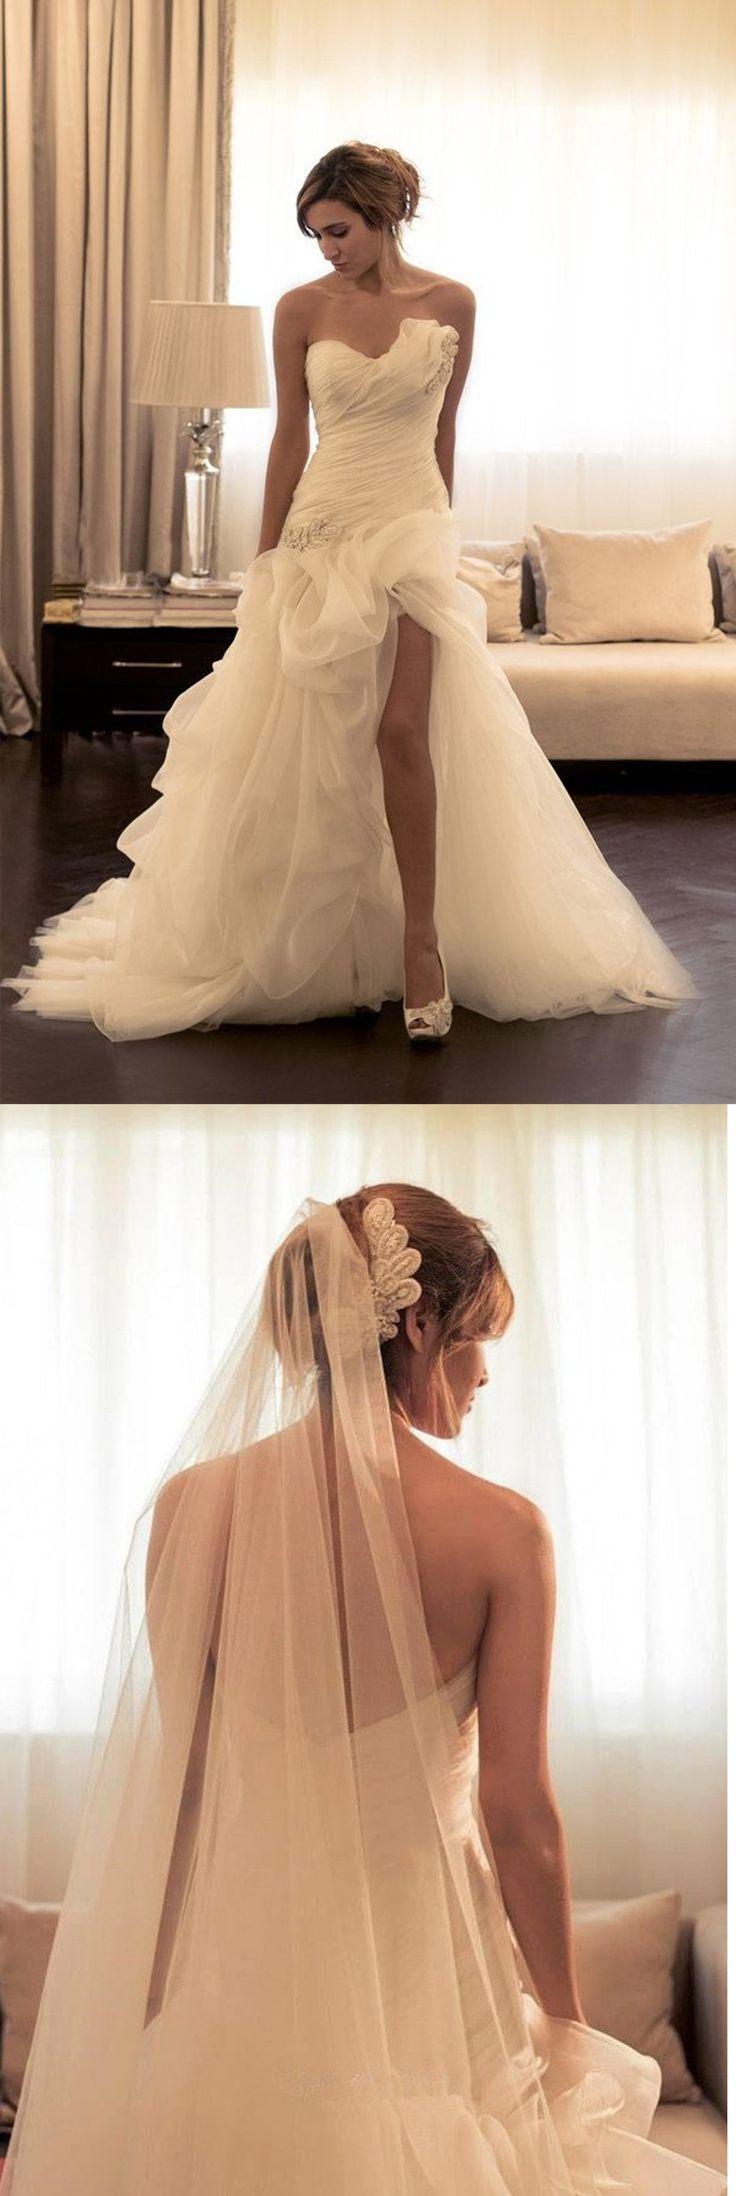 Sexy Ruffles Sweetheart Sleeveless Wedding Dress With Beading,HU89